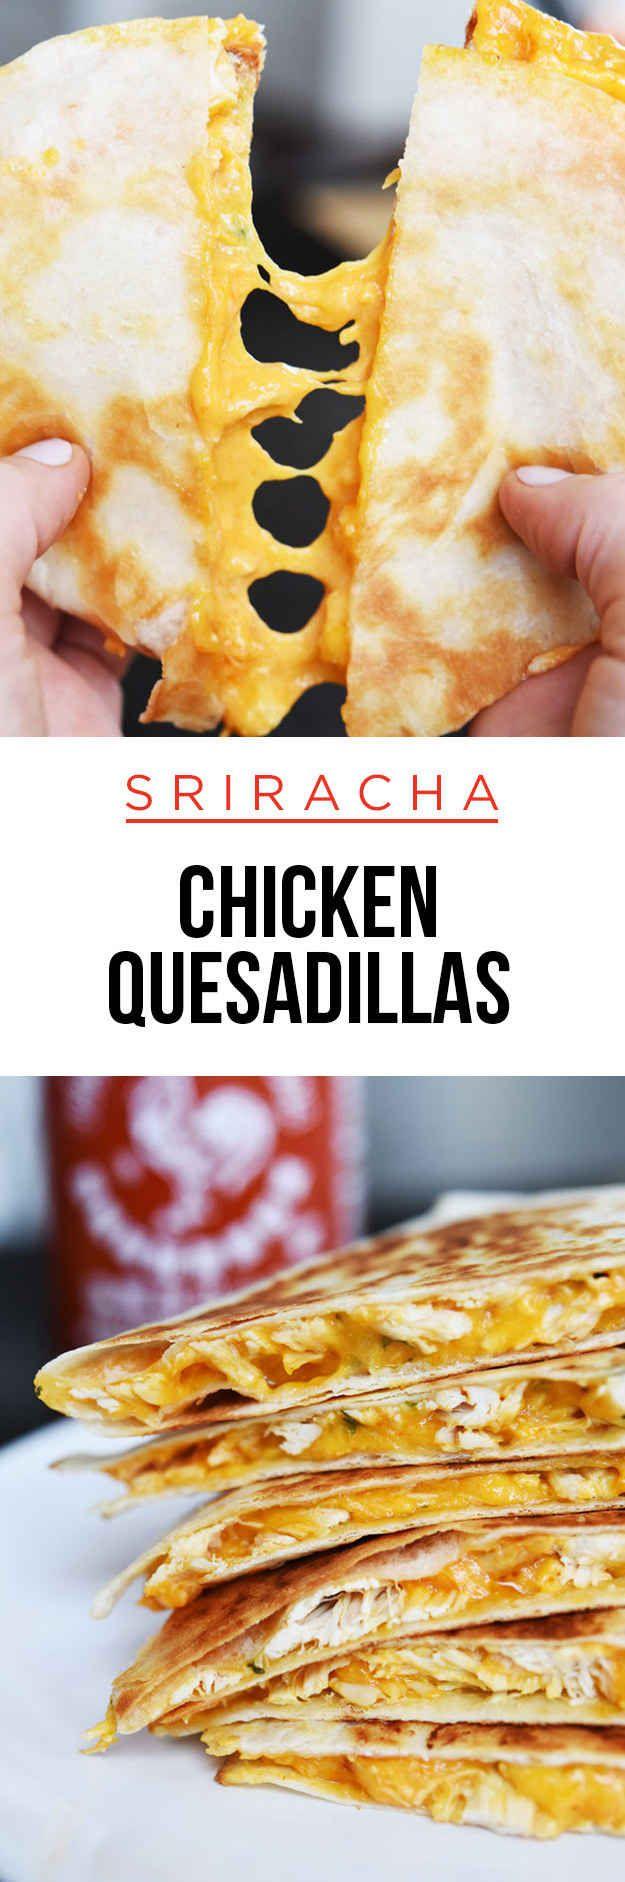 These Sriracha Quesadillas Will Make Everyone Love You